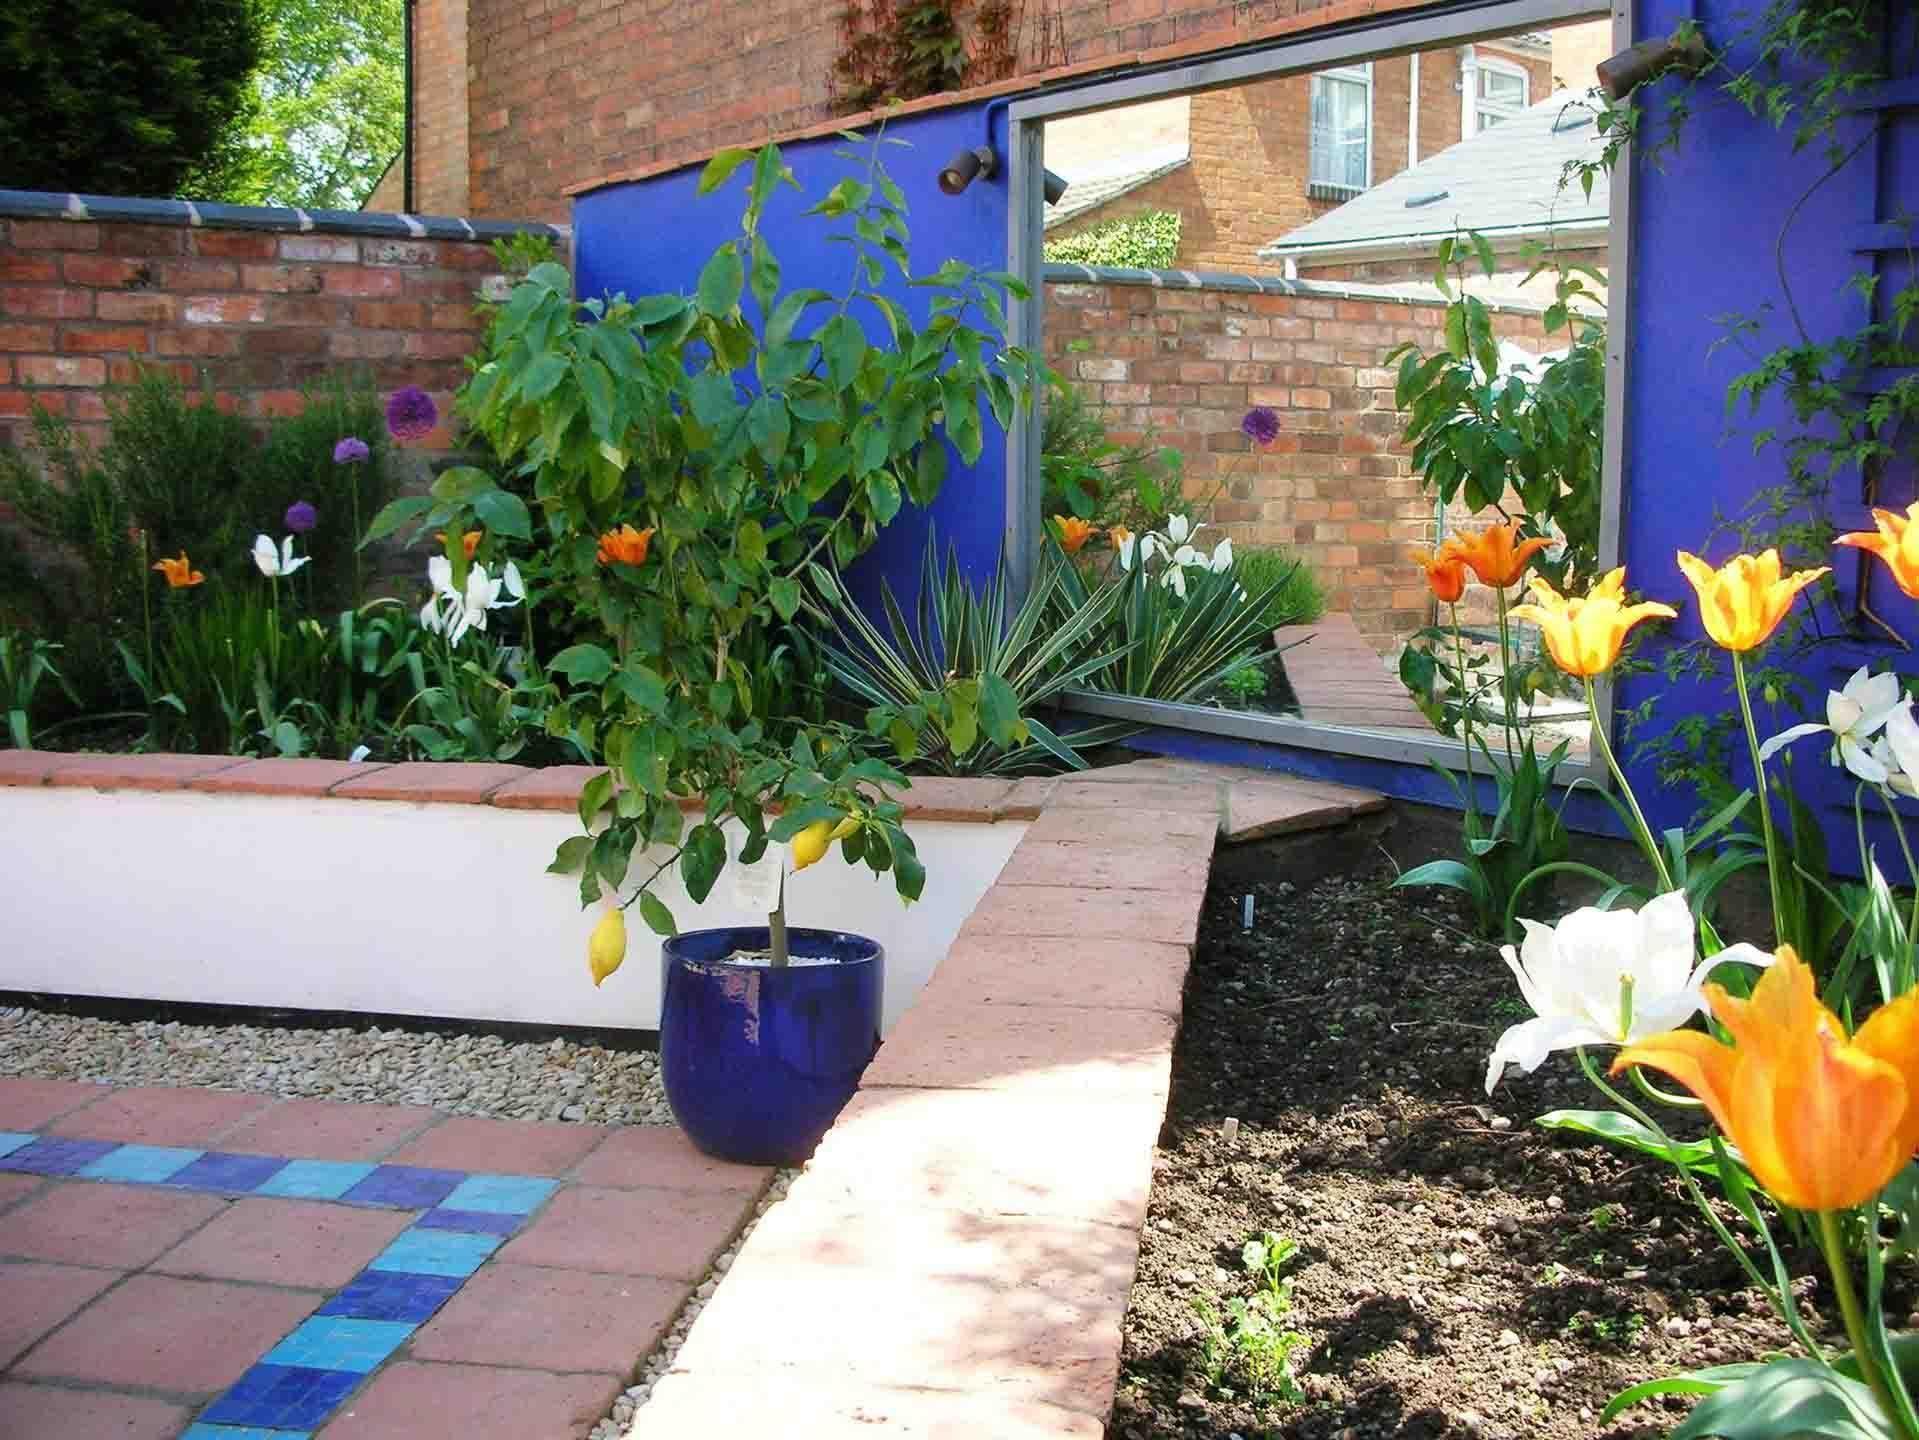 Great Useful Mediterranean Garden Design About Small Home Remodel Ideas With Mediterranean  Garden Design | 2017 GARDEN (front) Ideas | Pinterest | Garden Ideas, ...